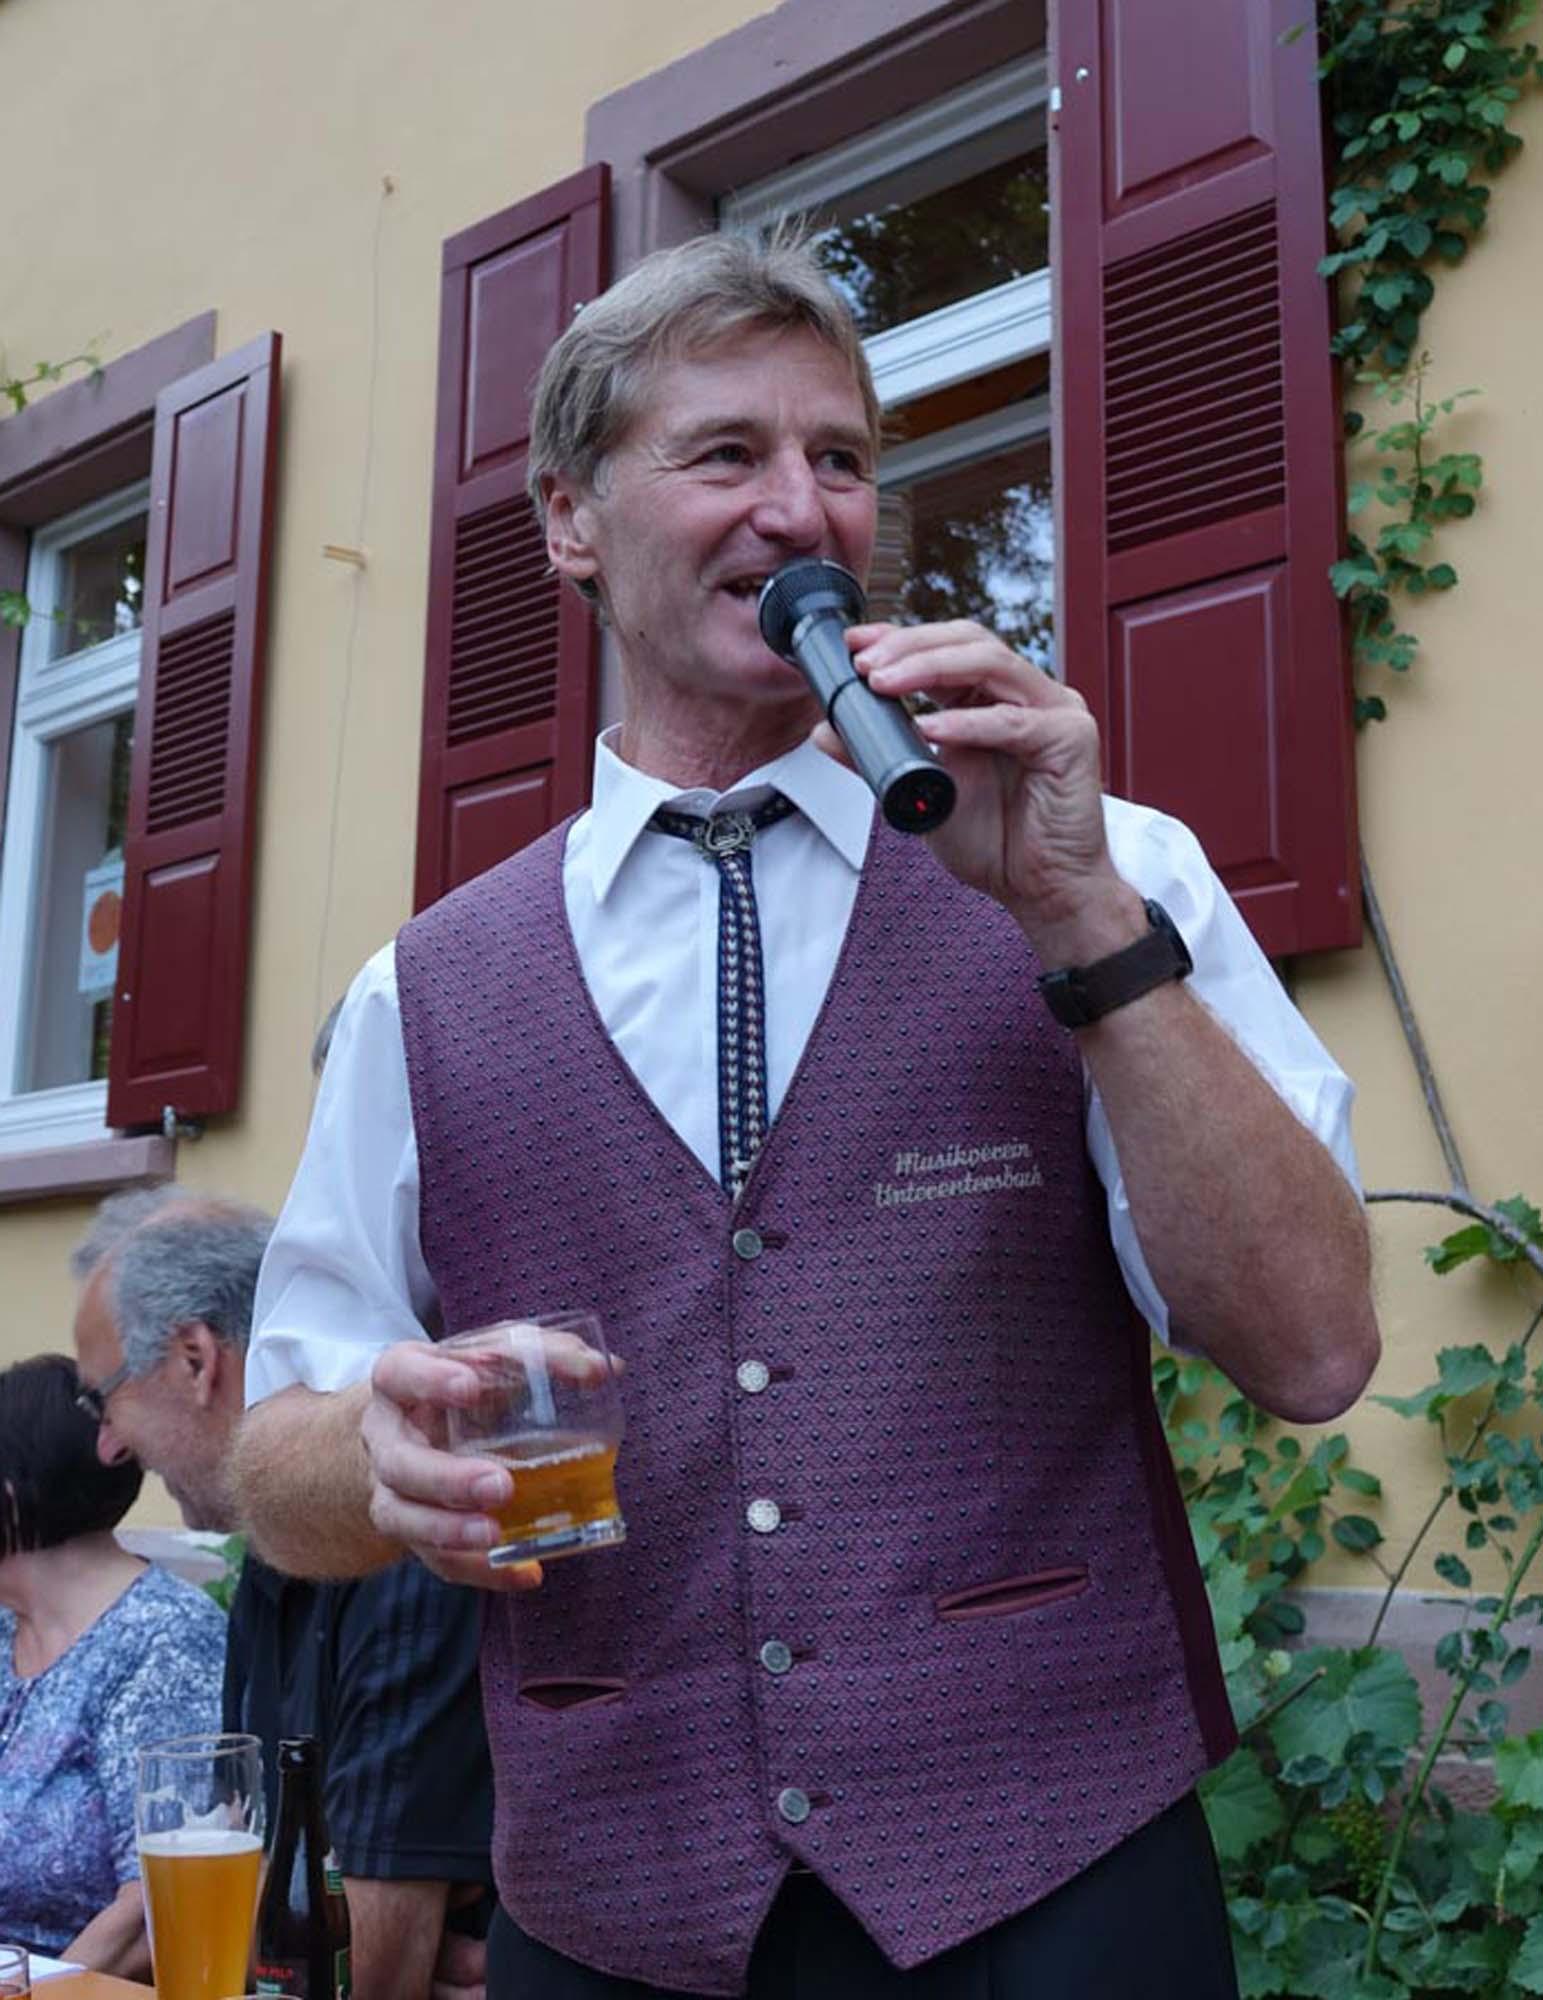 2019-7-15-ZE-OE-Eberhard Kramer-Hock Oberentersbach mit Musikverein Unterentersbach 2019-DSC03367